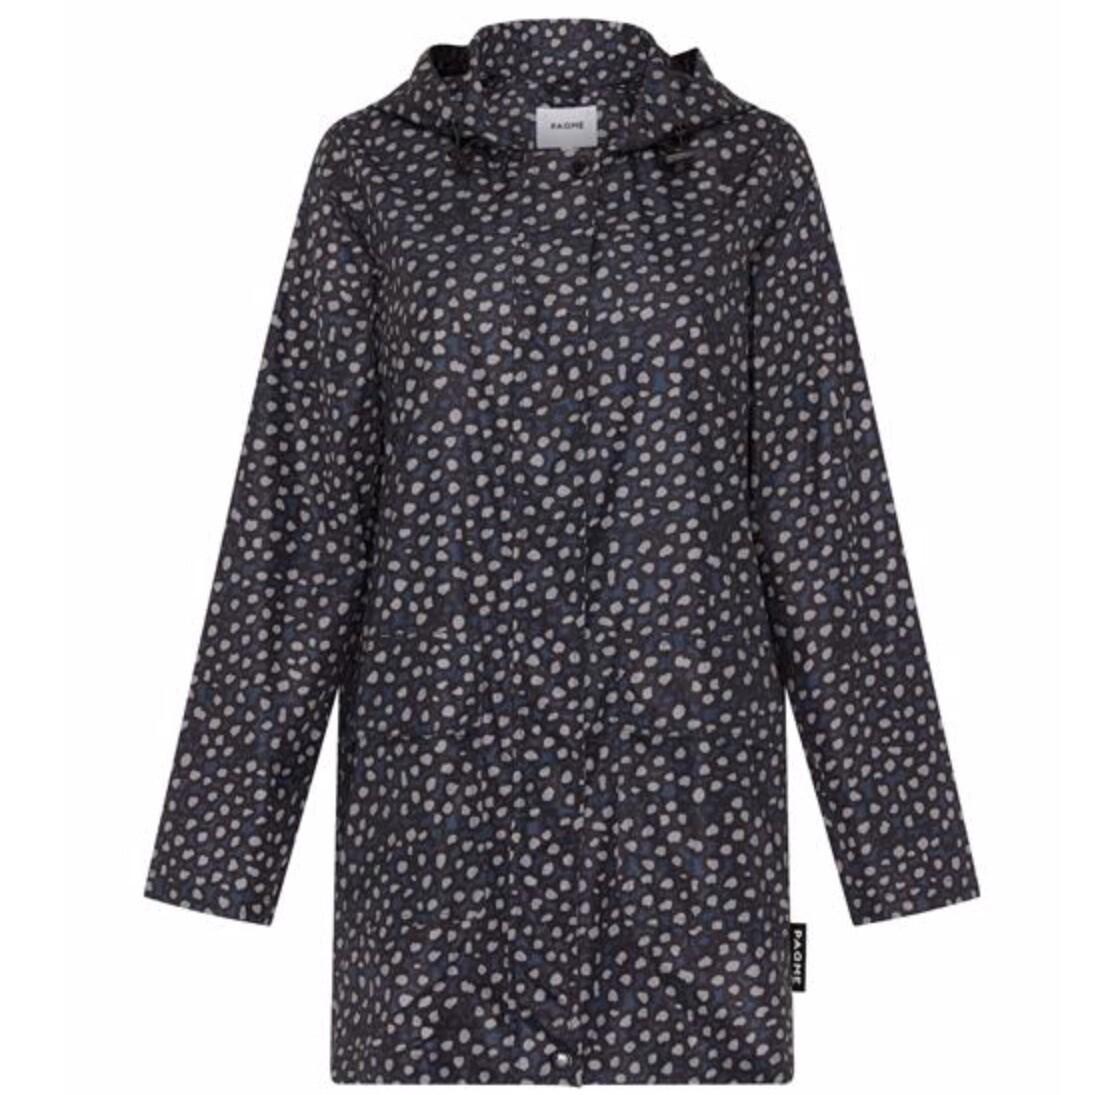 Womans Anyday Raincoat - Pebble Navy